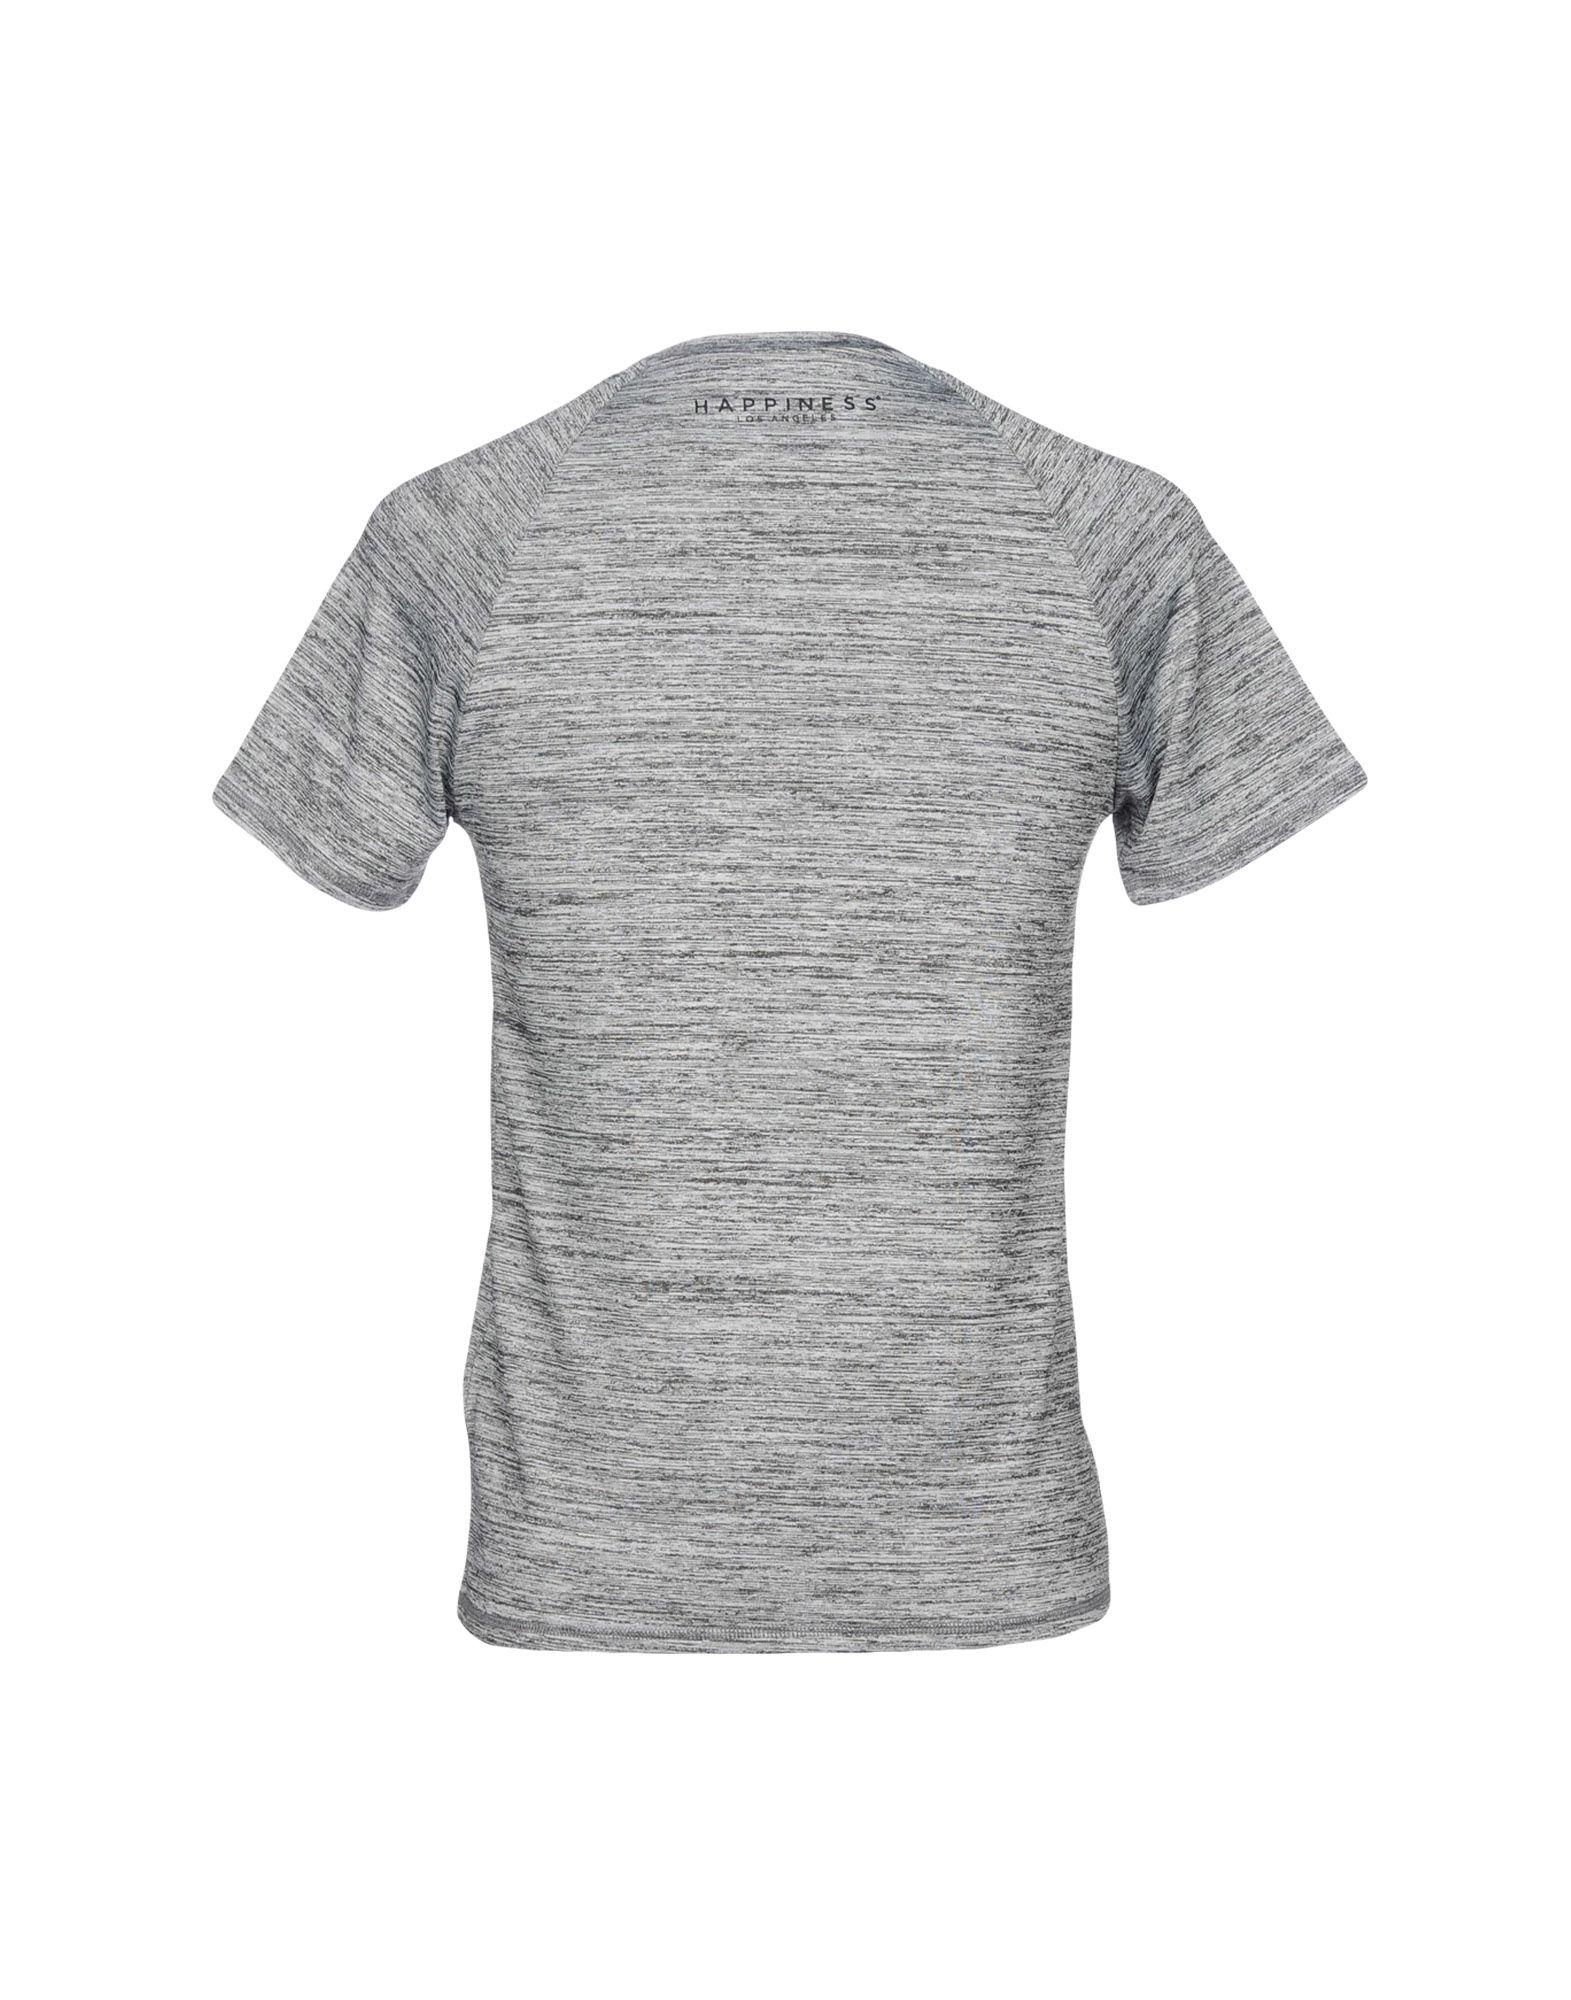 A buon mercato A buon mercato T-Shirt Happiness 12172336GL Uomo - 12172336GL Happiness 4f0e6e